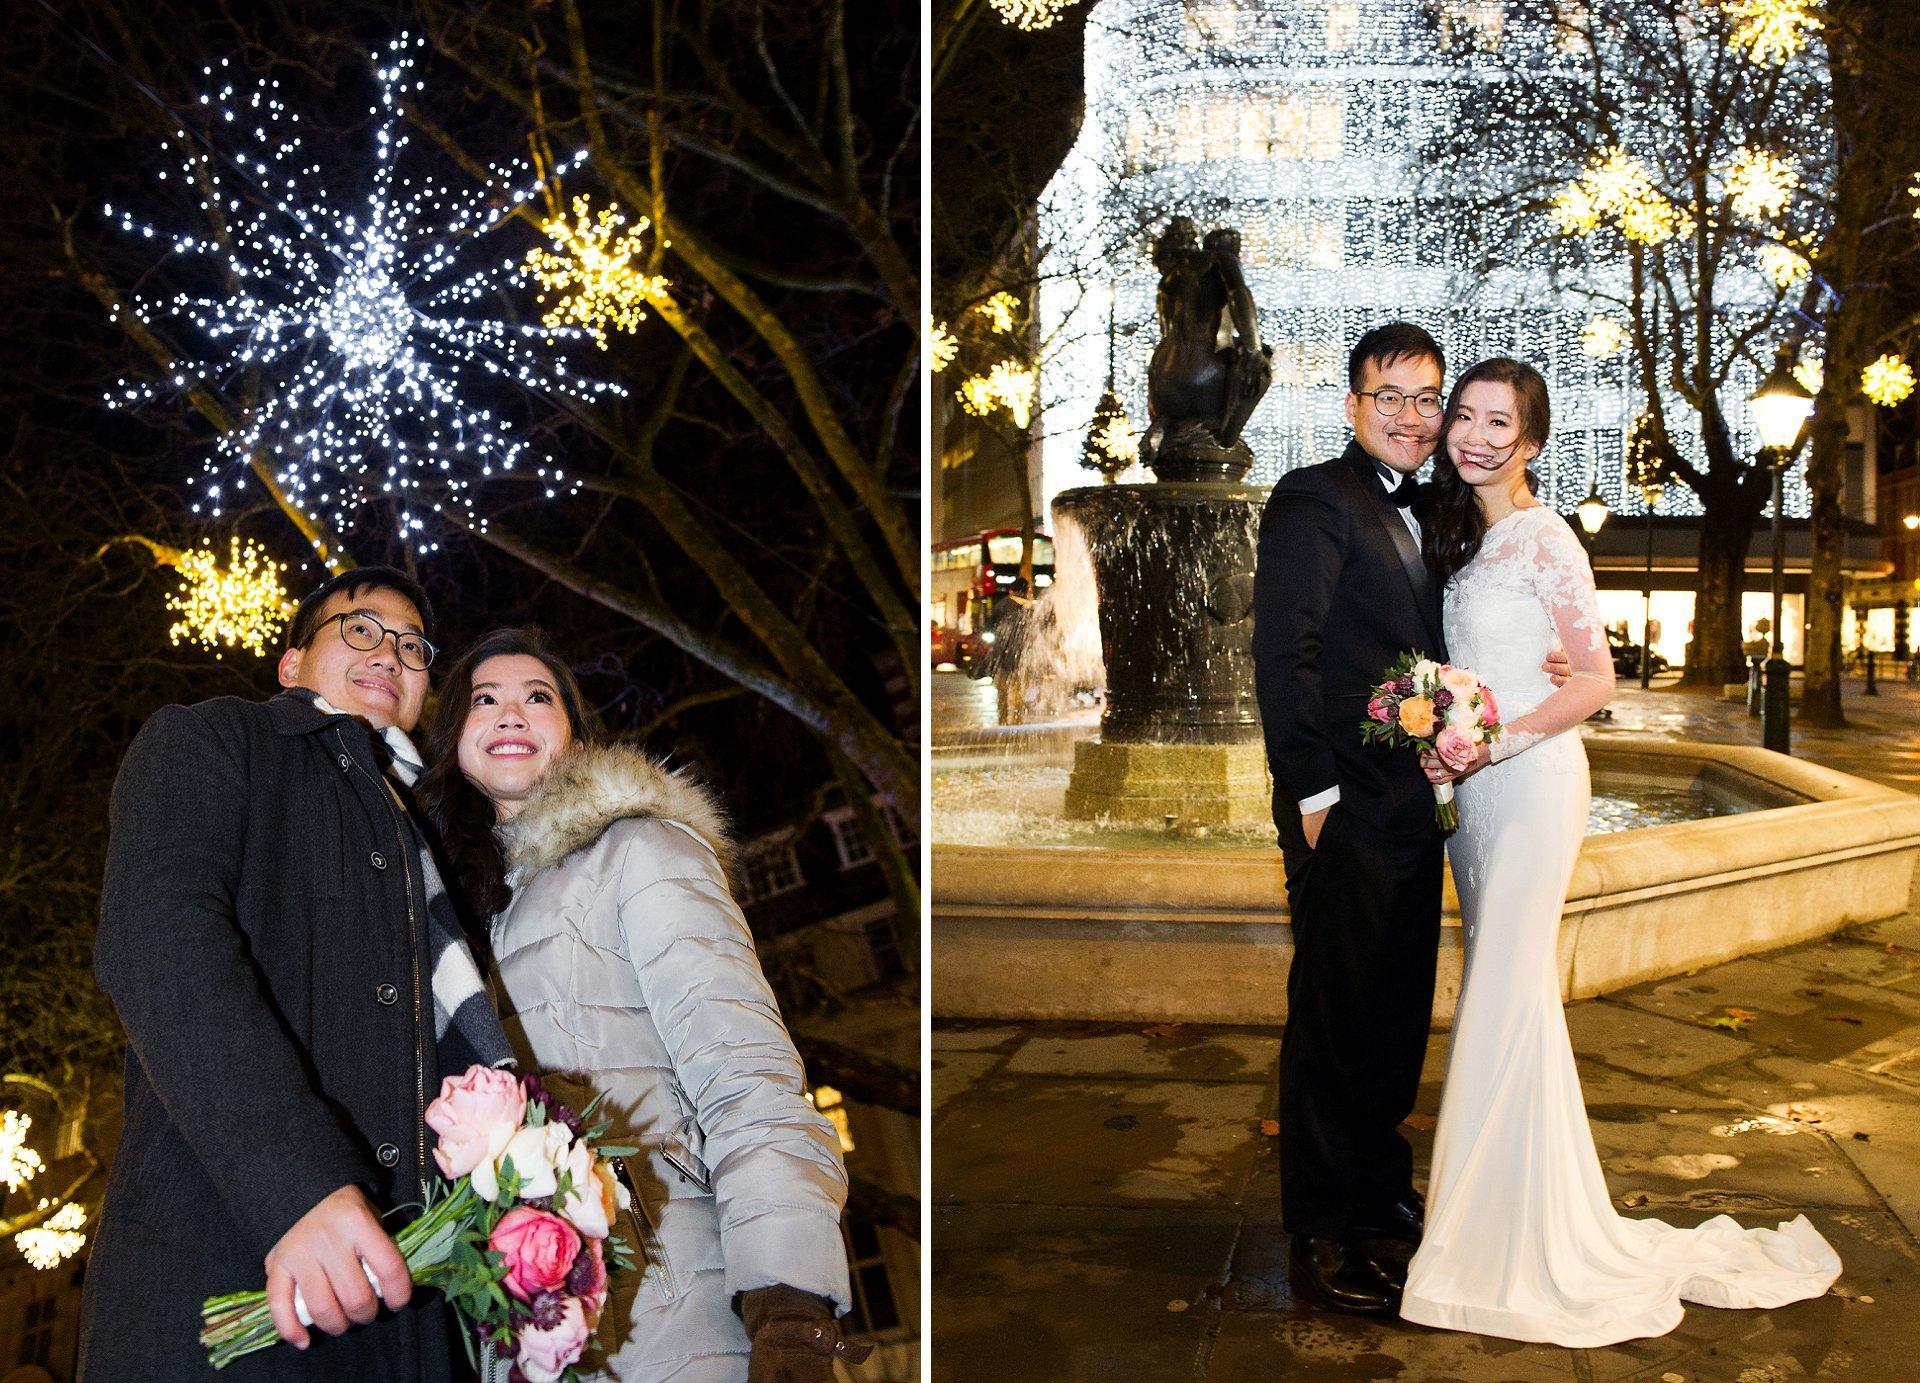 Christmas wedding reception in Mayfair using Christmas lights for couple portraits